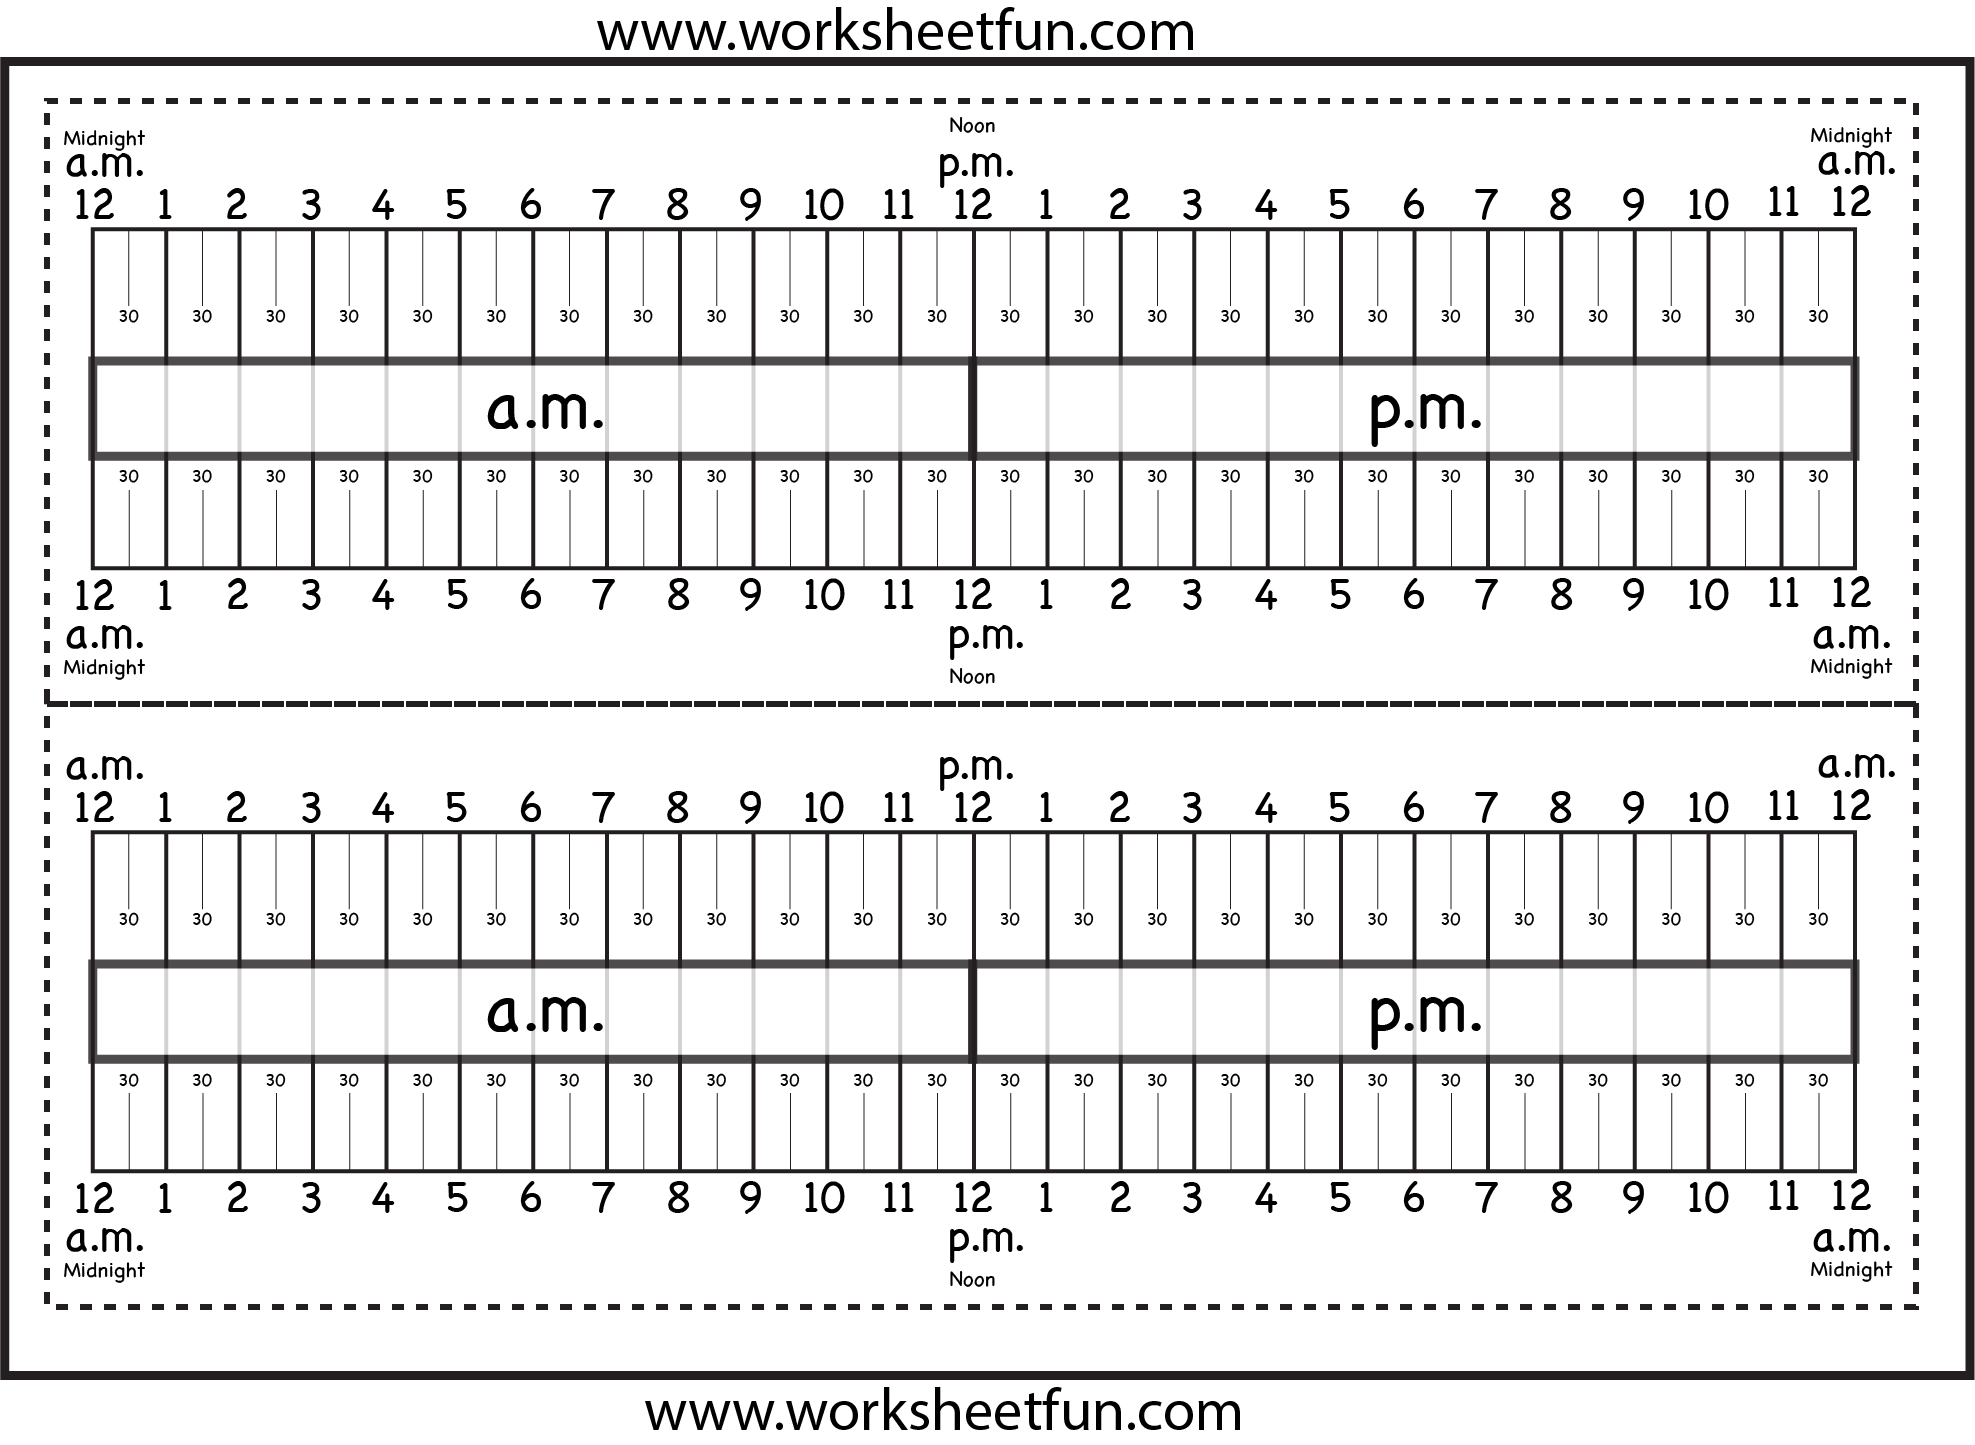 Level 2 Elapsed Time Ruler Six Worksheets Free Printable Worksheets Worksheetfun